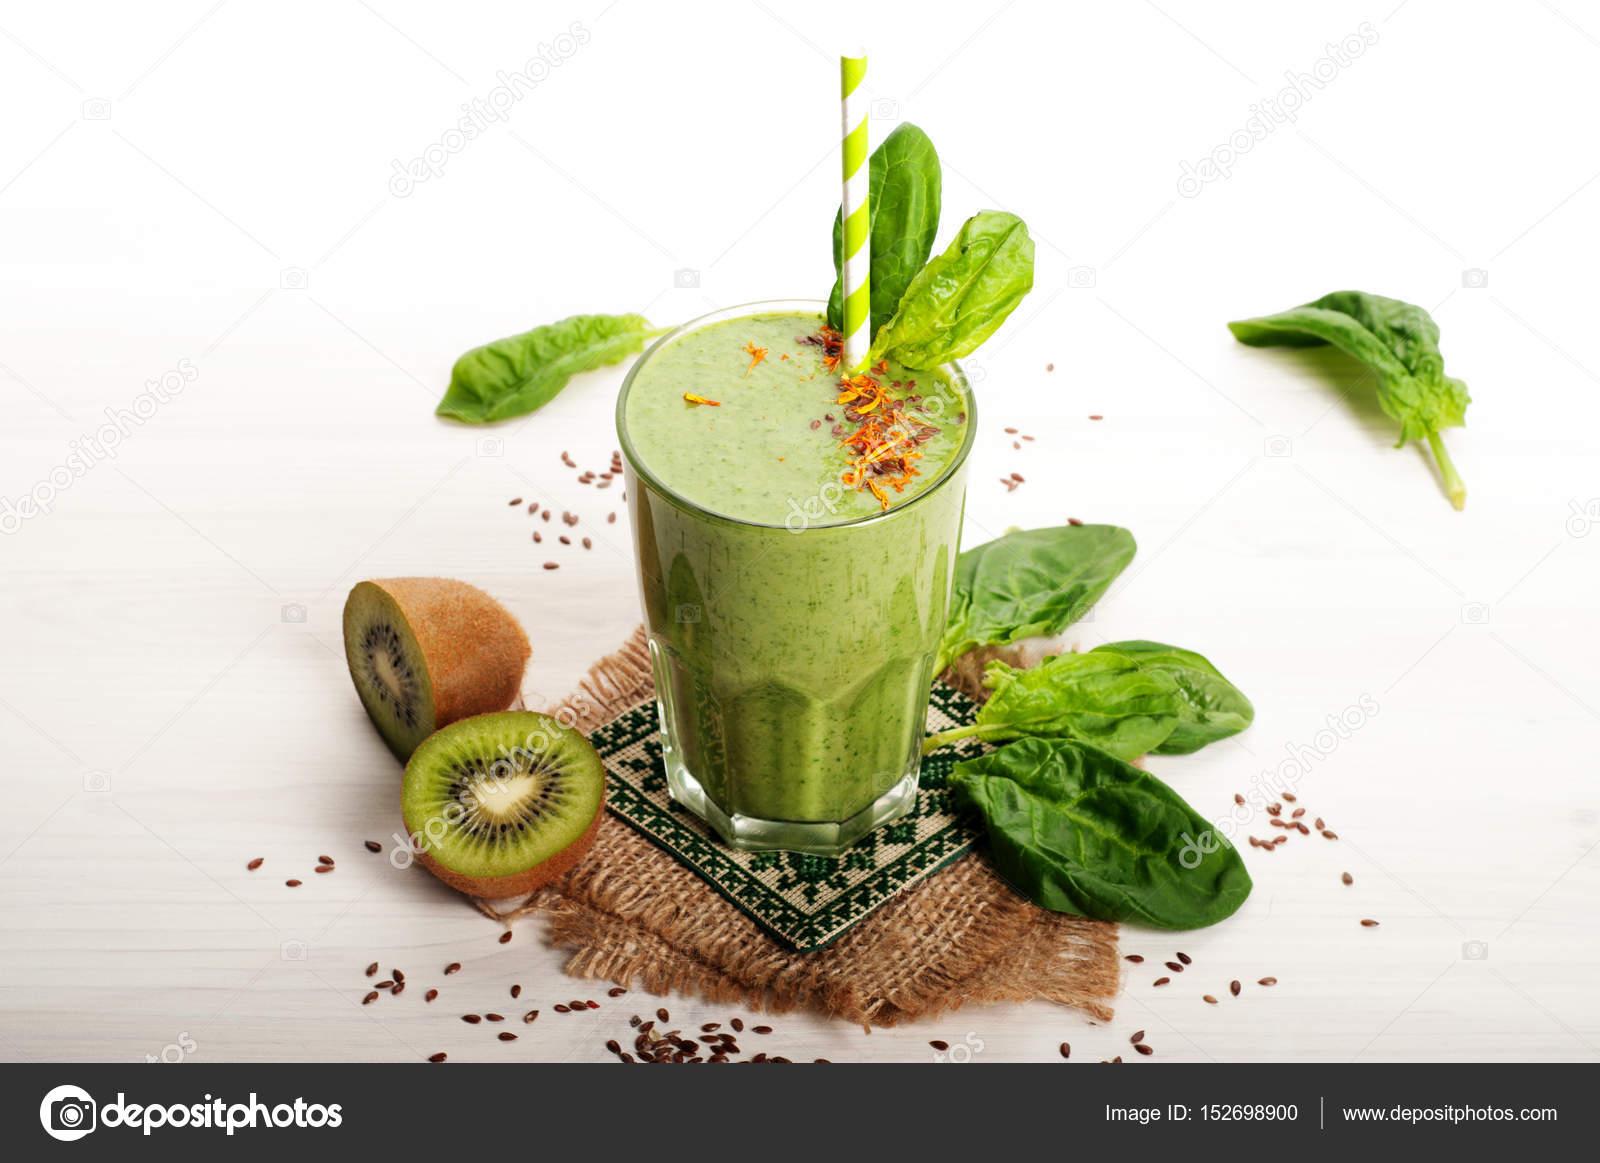 Grune Smoothies Gesunde Diat Erfrischungsgetrank Aus Apfel Kiwi